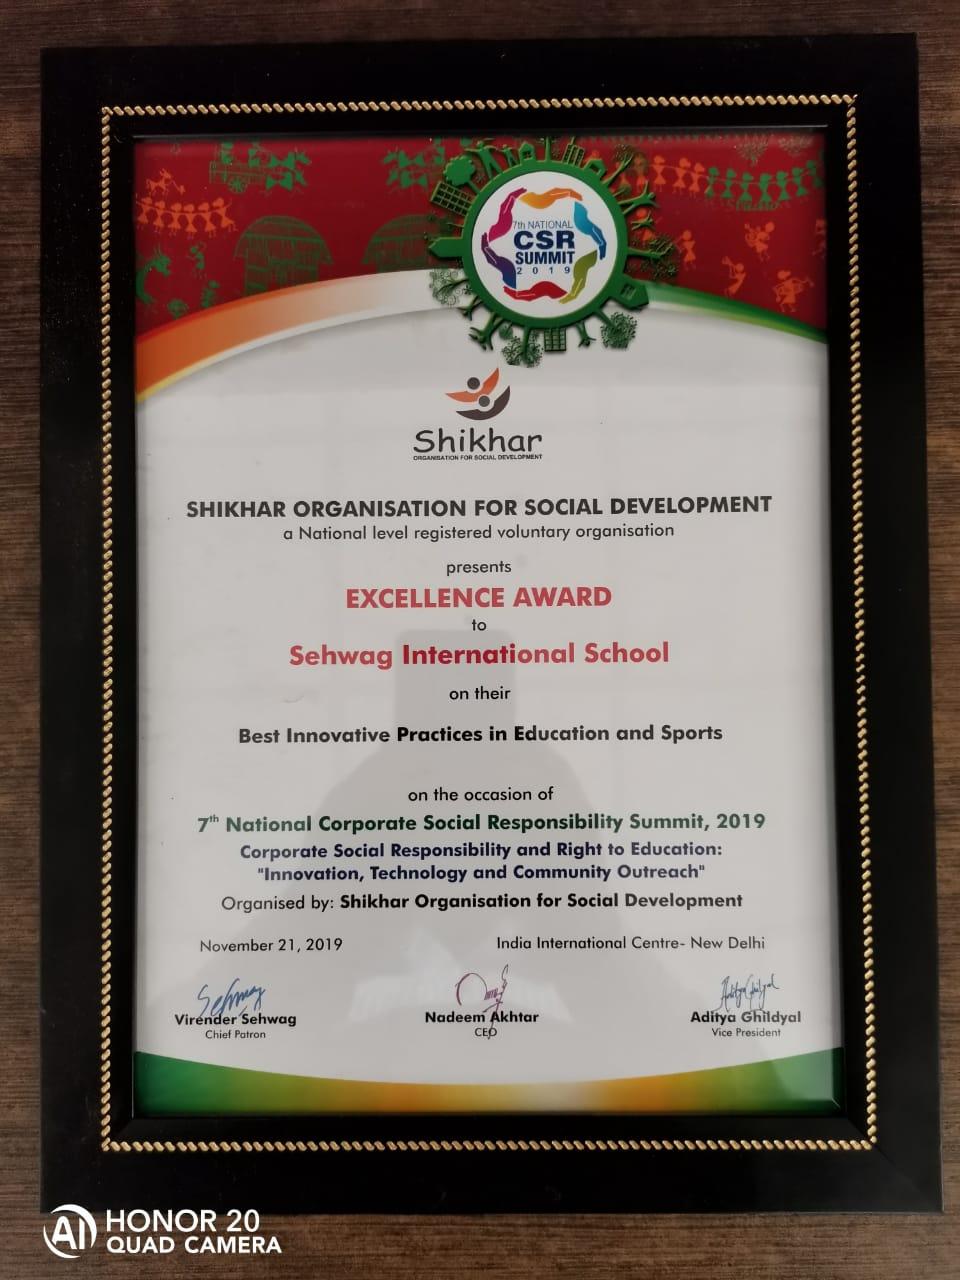 Sehwag International School awarded Excellence Award by Shikhar Organisation